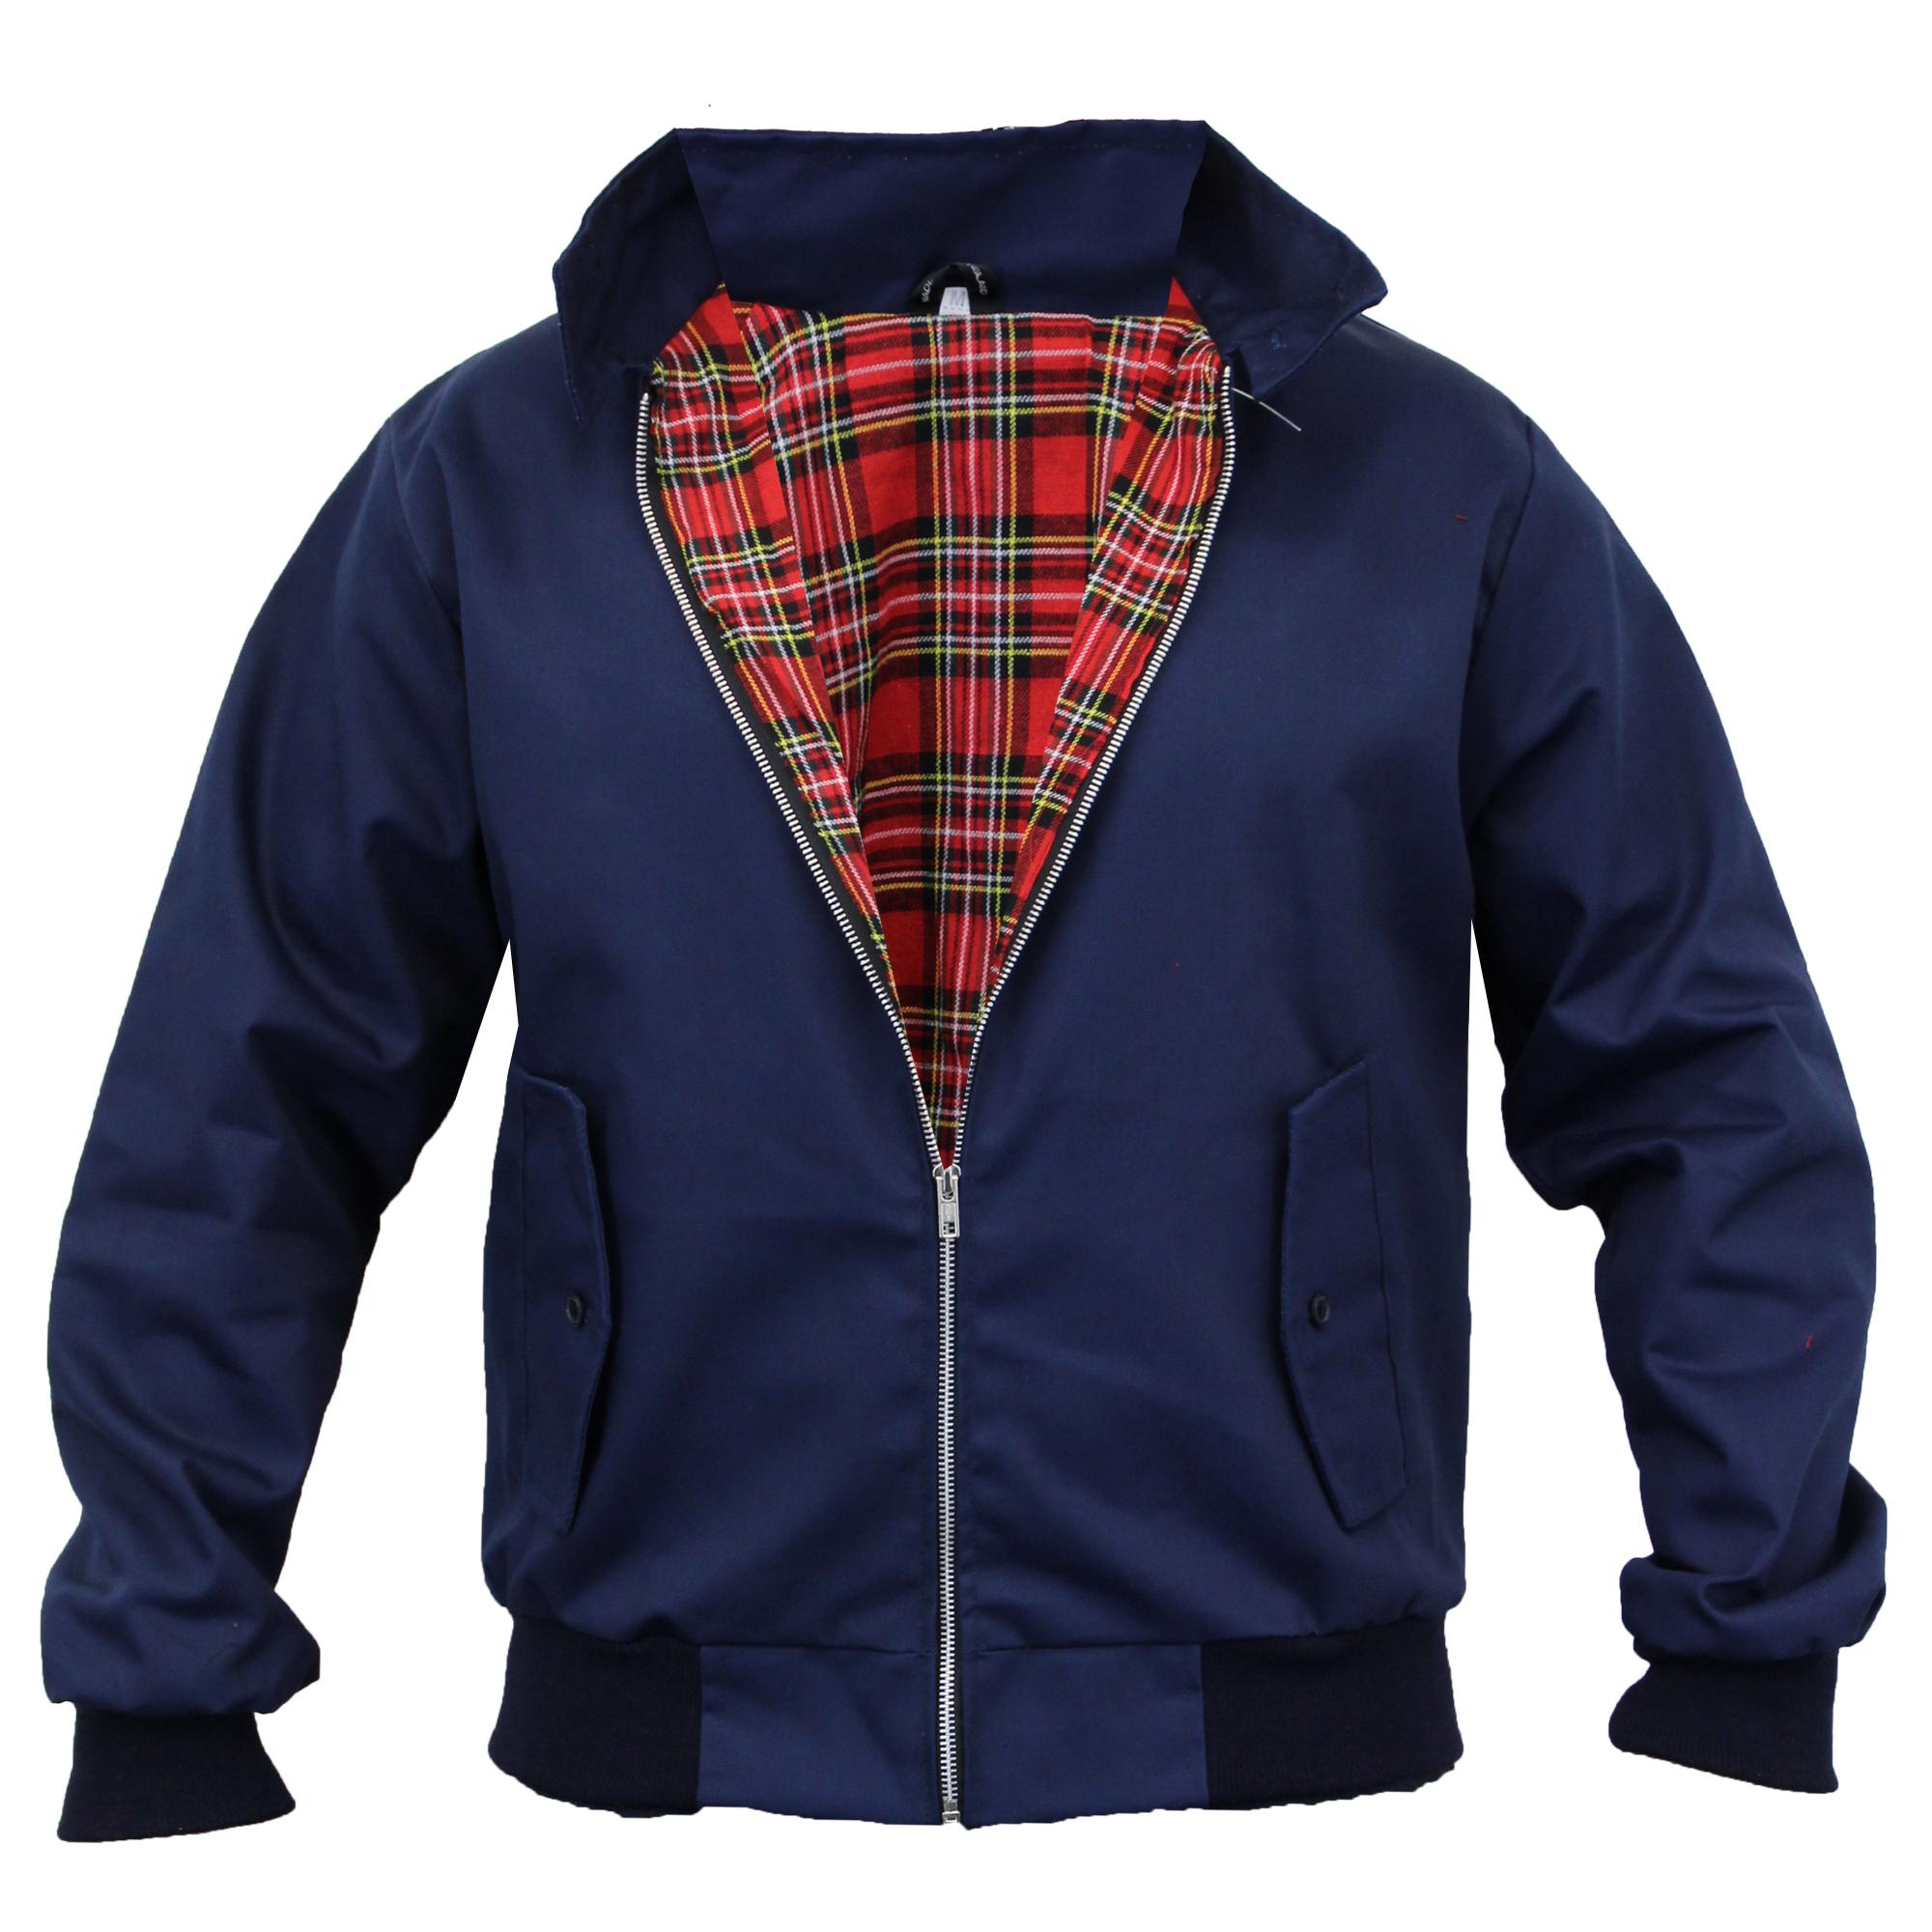 Mens Harrington Jacket Coat Retro Vintage Bomber Tartan Check Lined ...